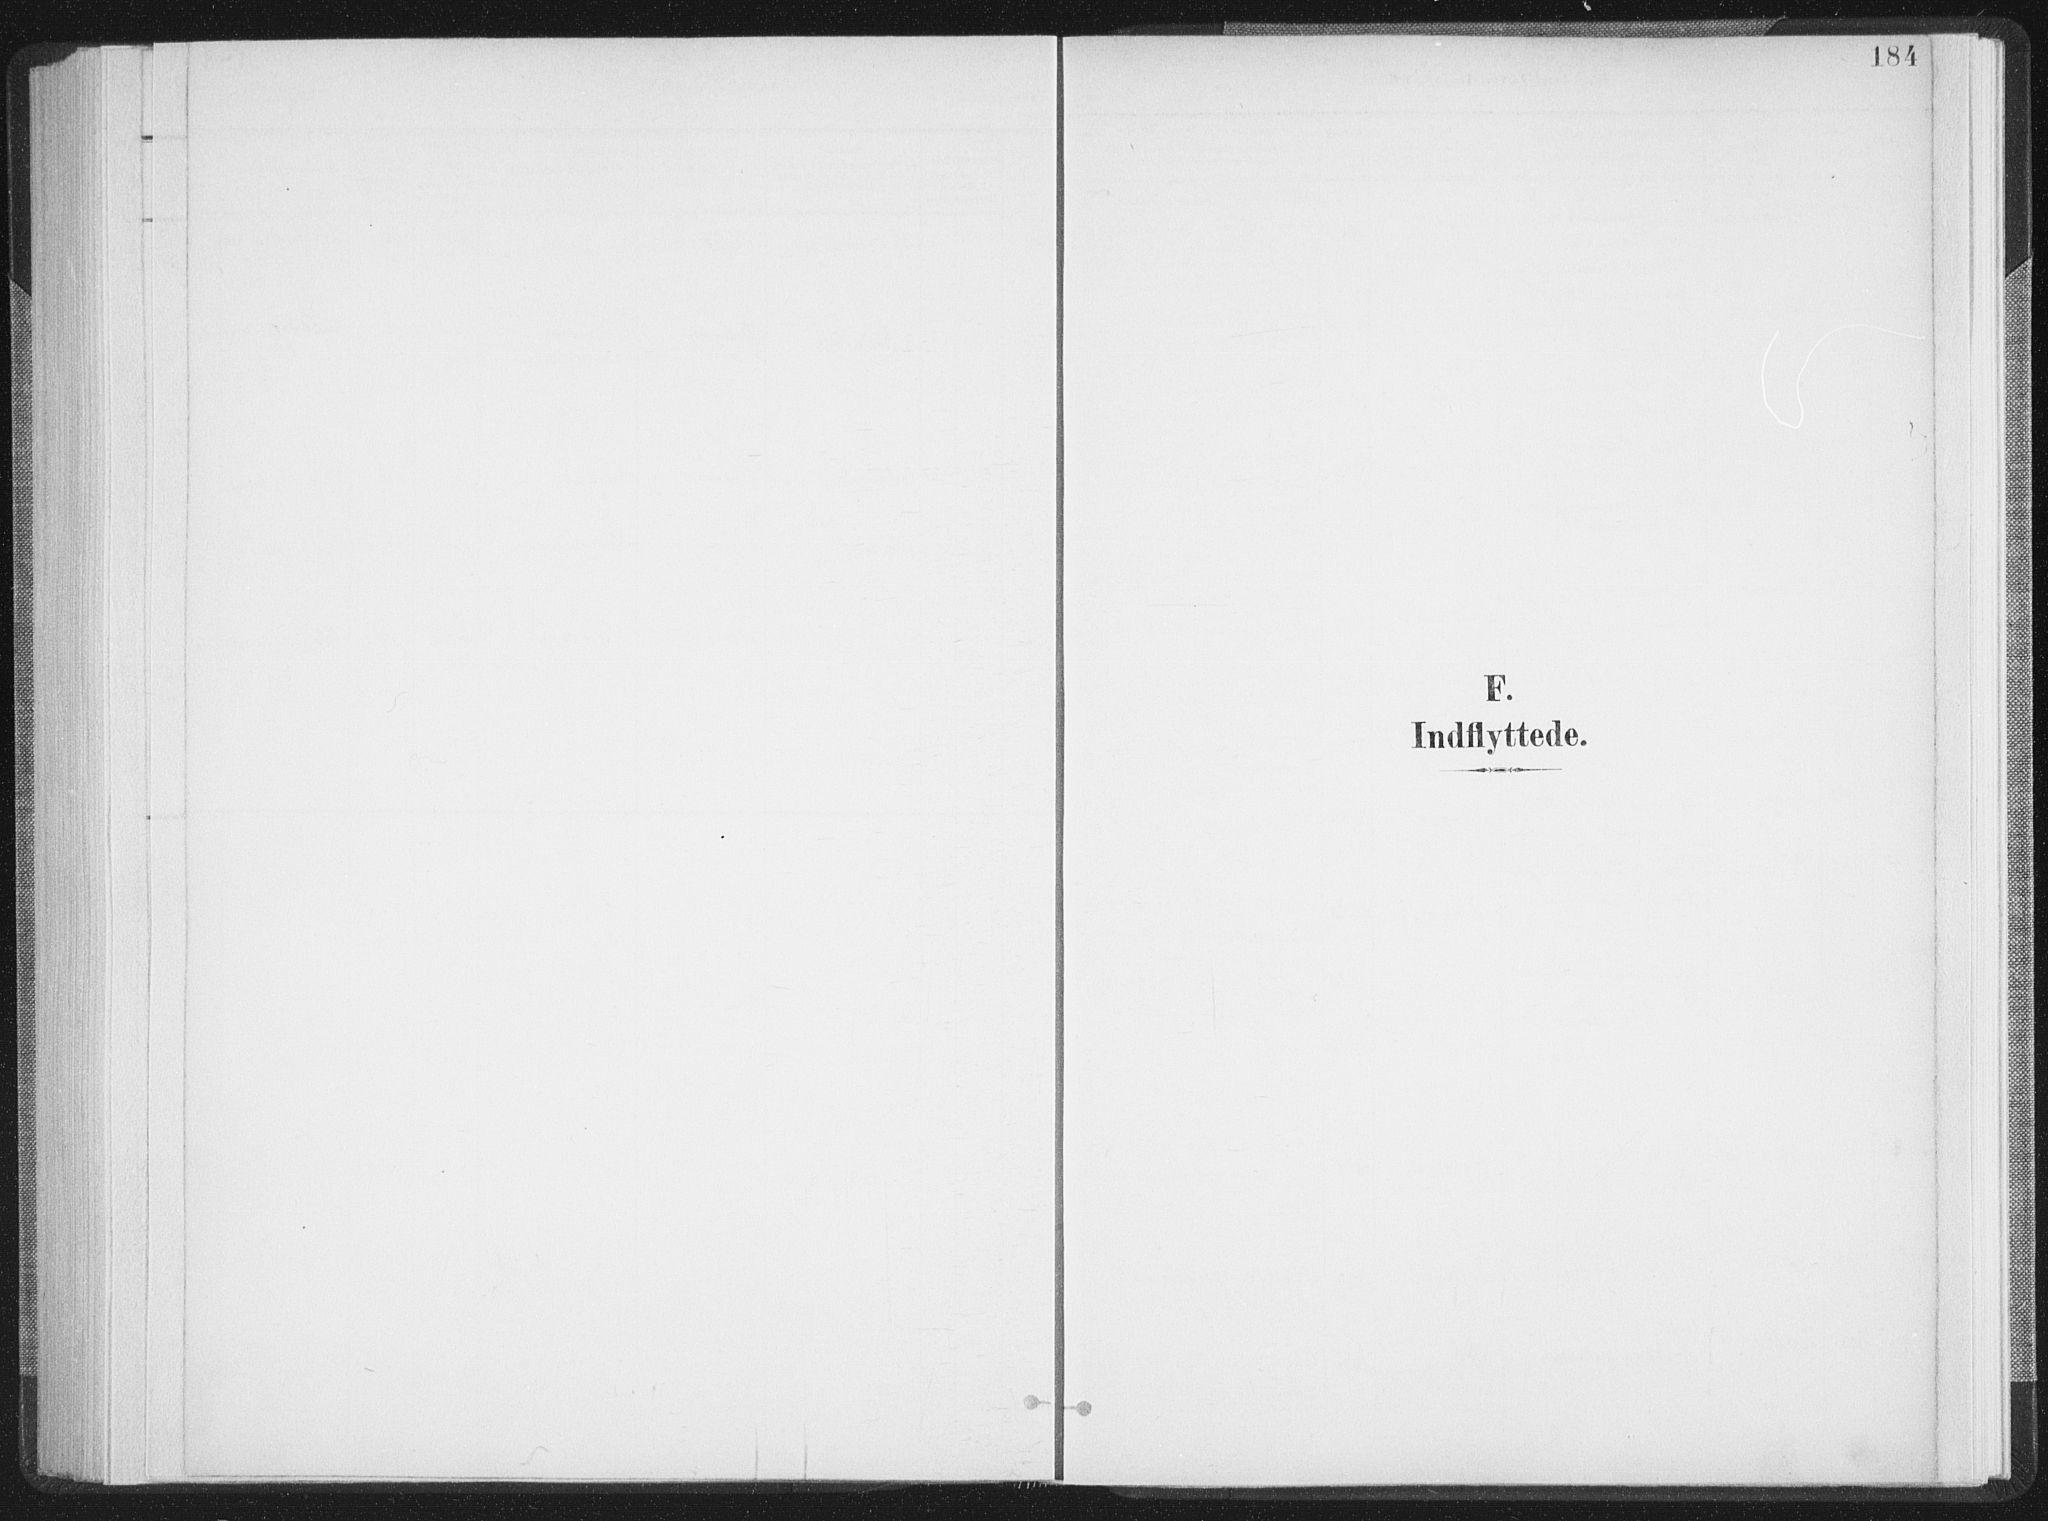 SAT, Ministerialprotokoller, klokkerbøker og fødselsregistre - Nordland, 897/L1400: Ministerialbok nr. 897A07, 1897-1908, s. 184